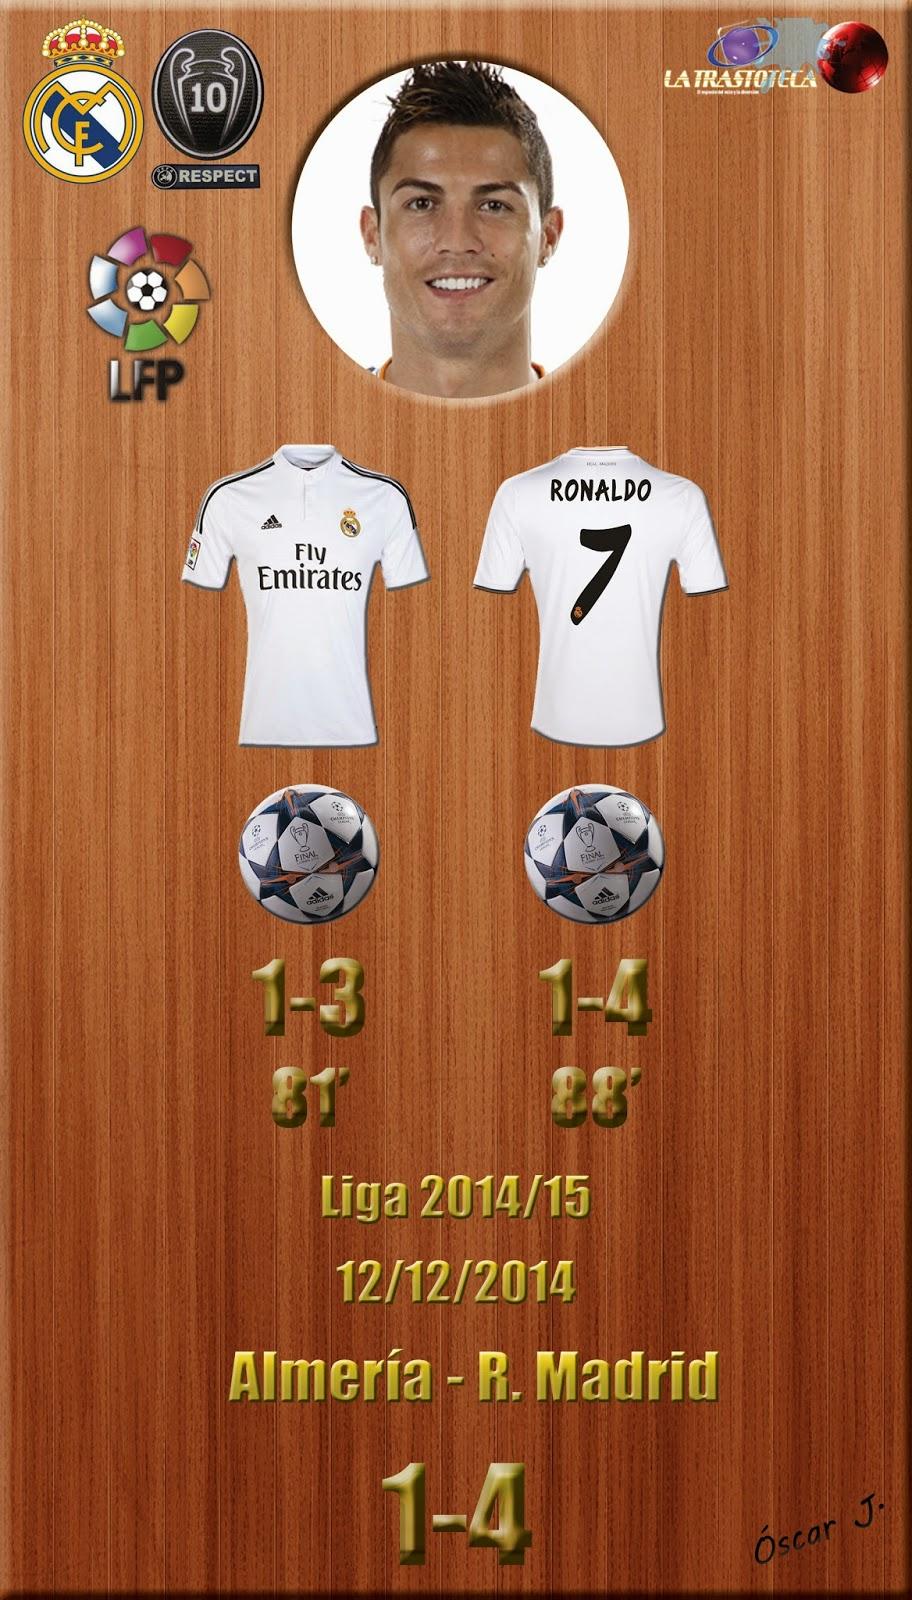 Cristiano Ronaldo (Doblete) - Almería 1-4 Real Madrid - Liga 2014/15 - Jornada 15 - (12/12/2014)